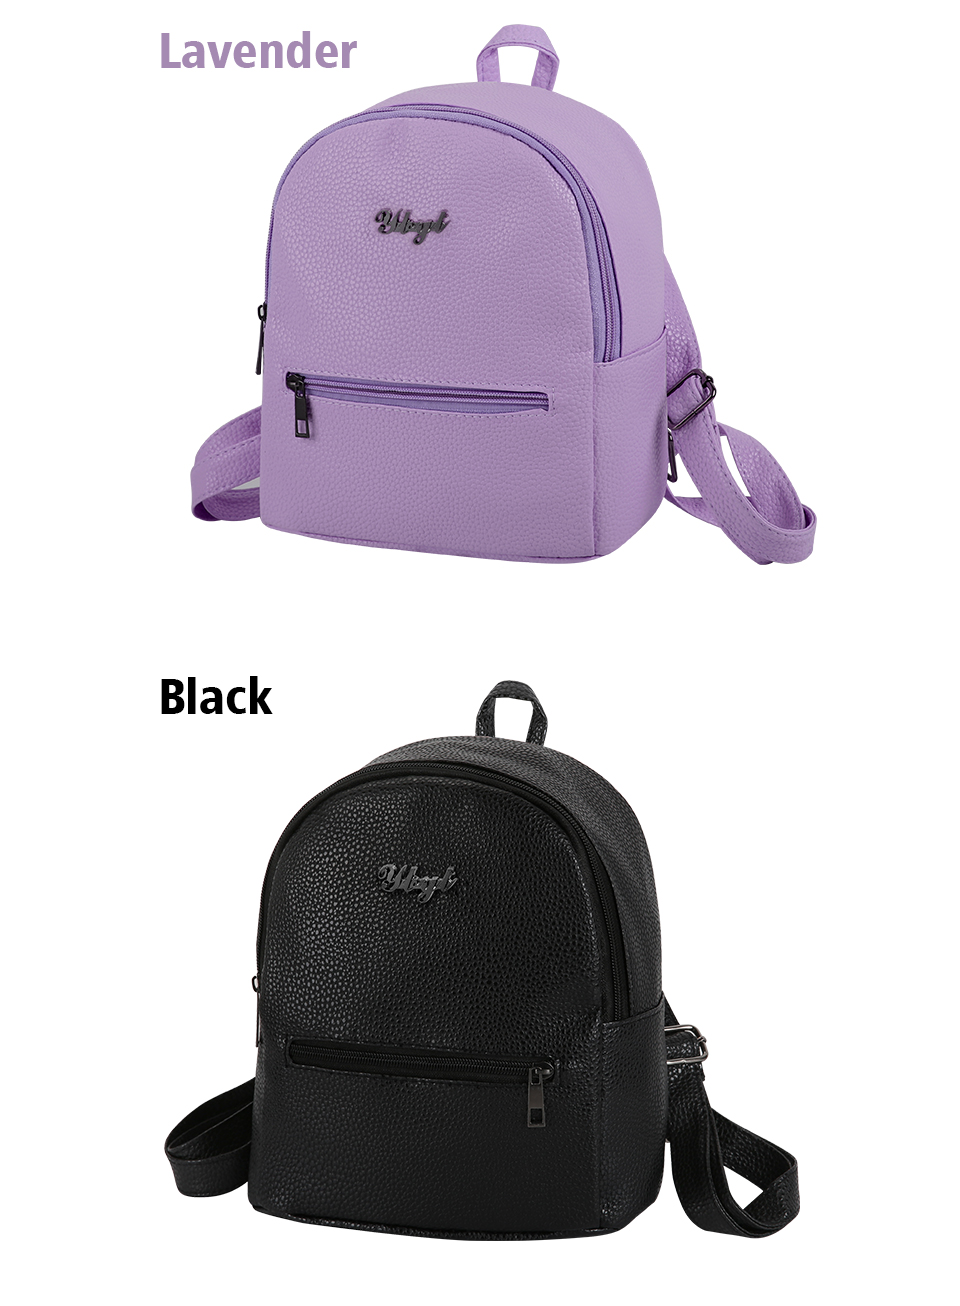 HTB1cF3qbBHH8KJjy0Fbq6AqlpXaG YBYT brand 2018 new preppy style solid women kawaii rucksack simple lychee pattern ladies travel bag student school backpacks